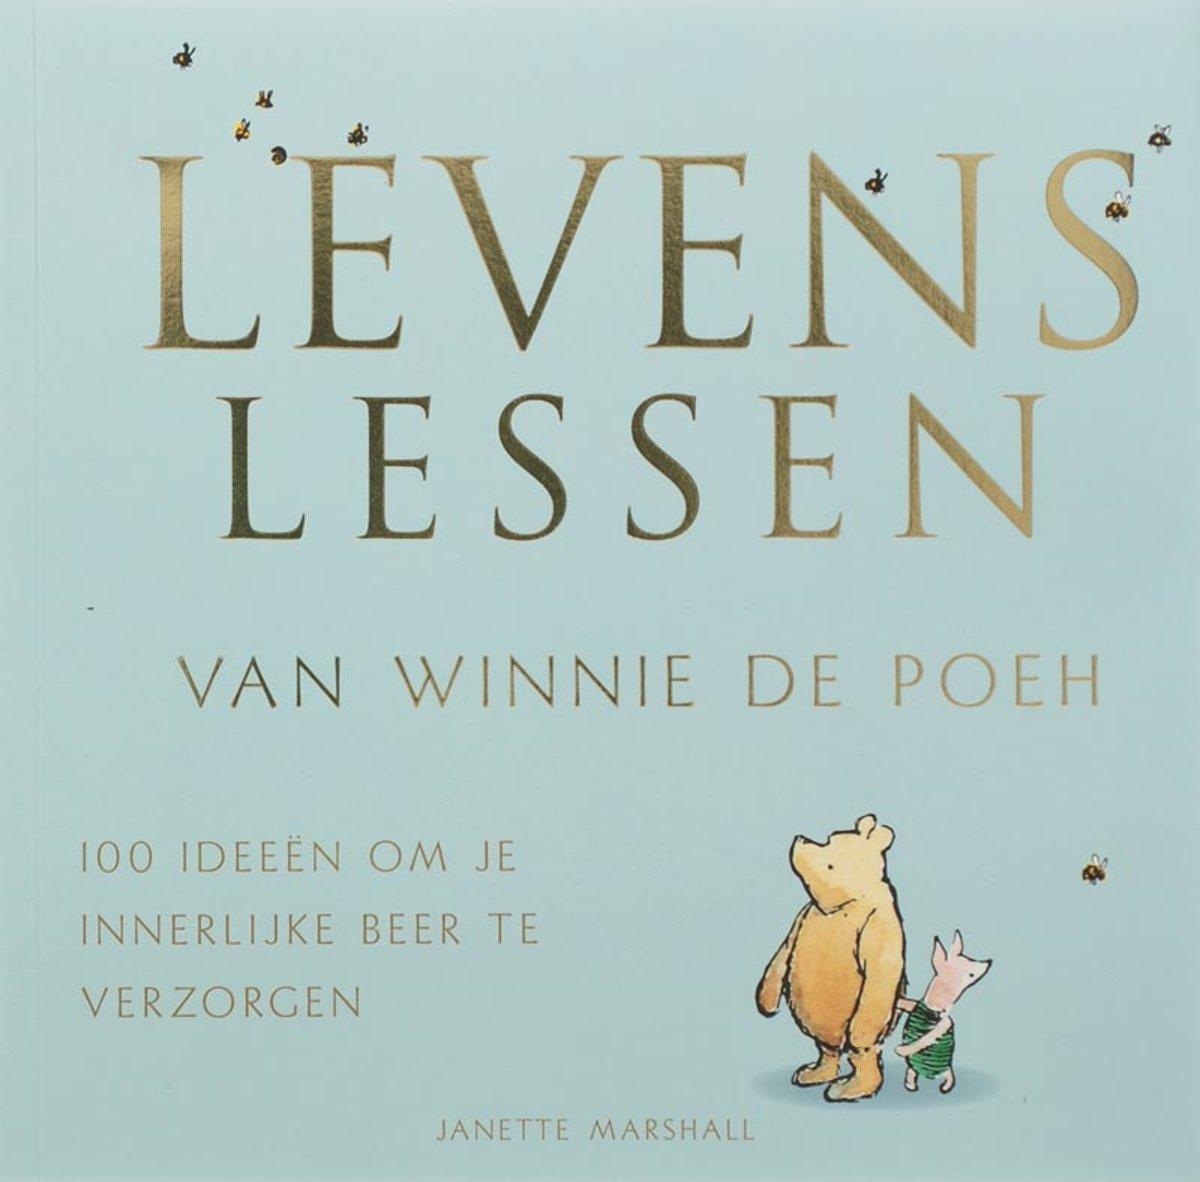 spreuken winnie the pooh bol.| Levenslessen Van Winnie De Poeh, Janette Marshall  spreuken winnie the pooh